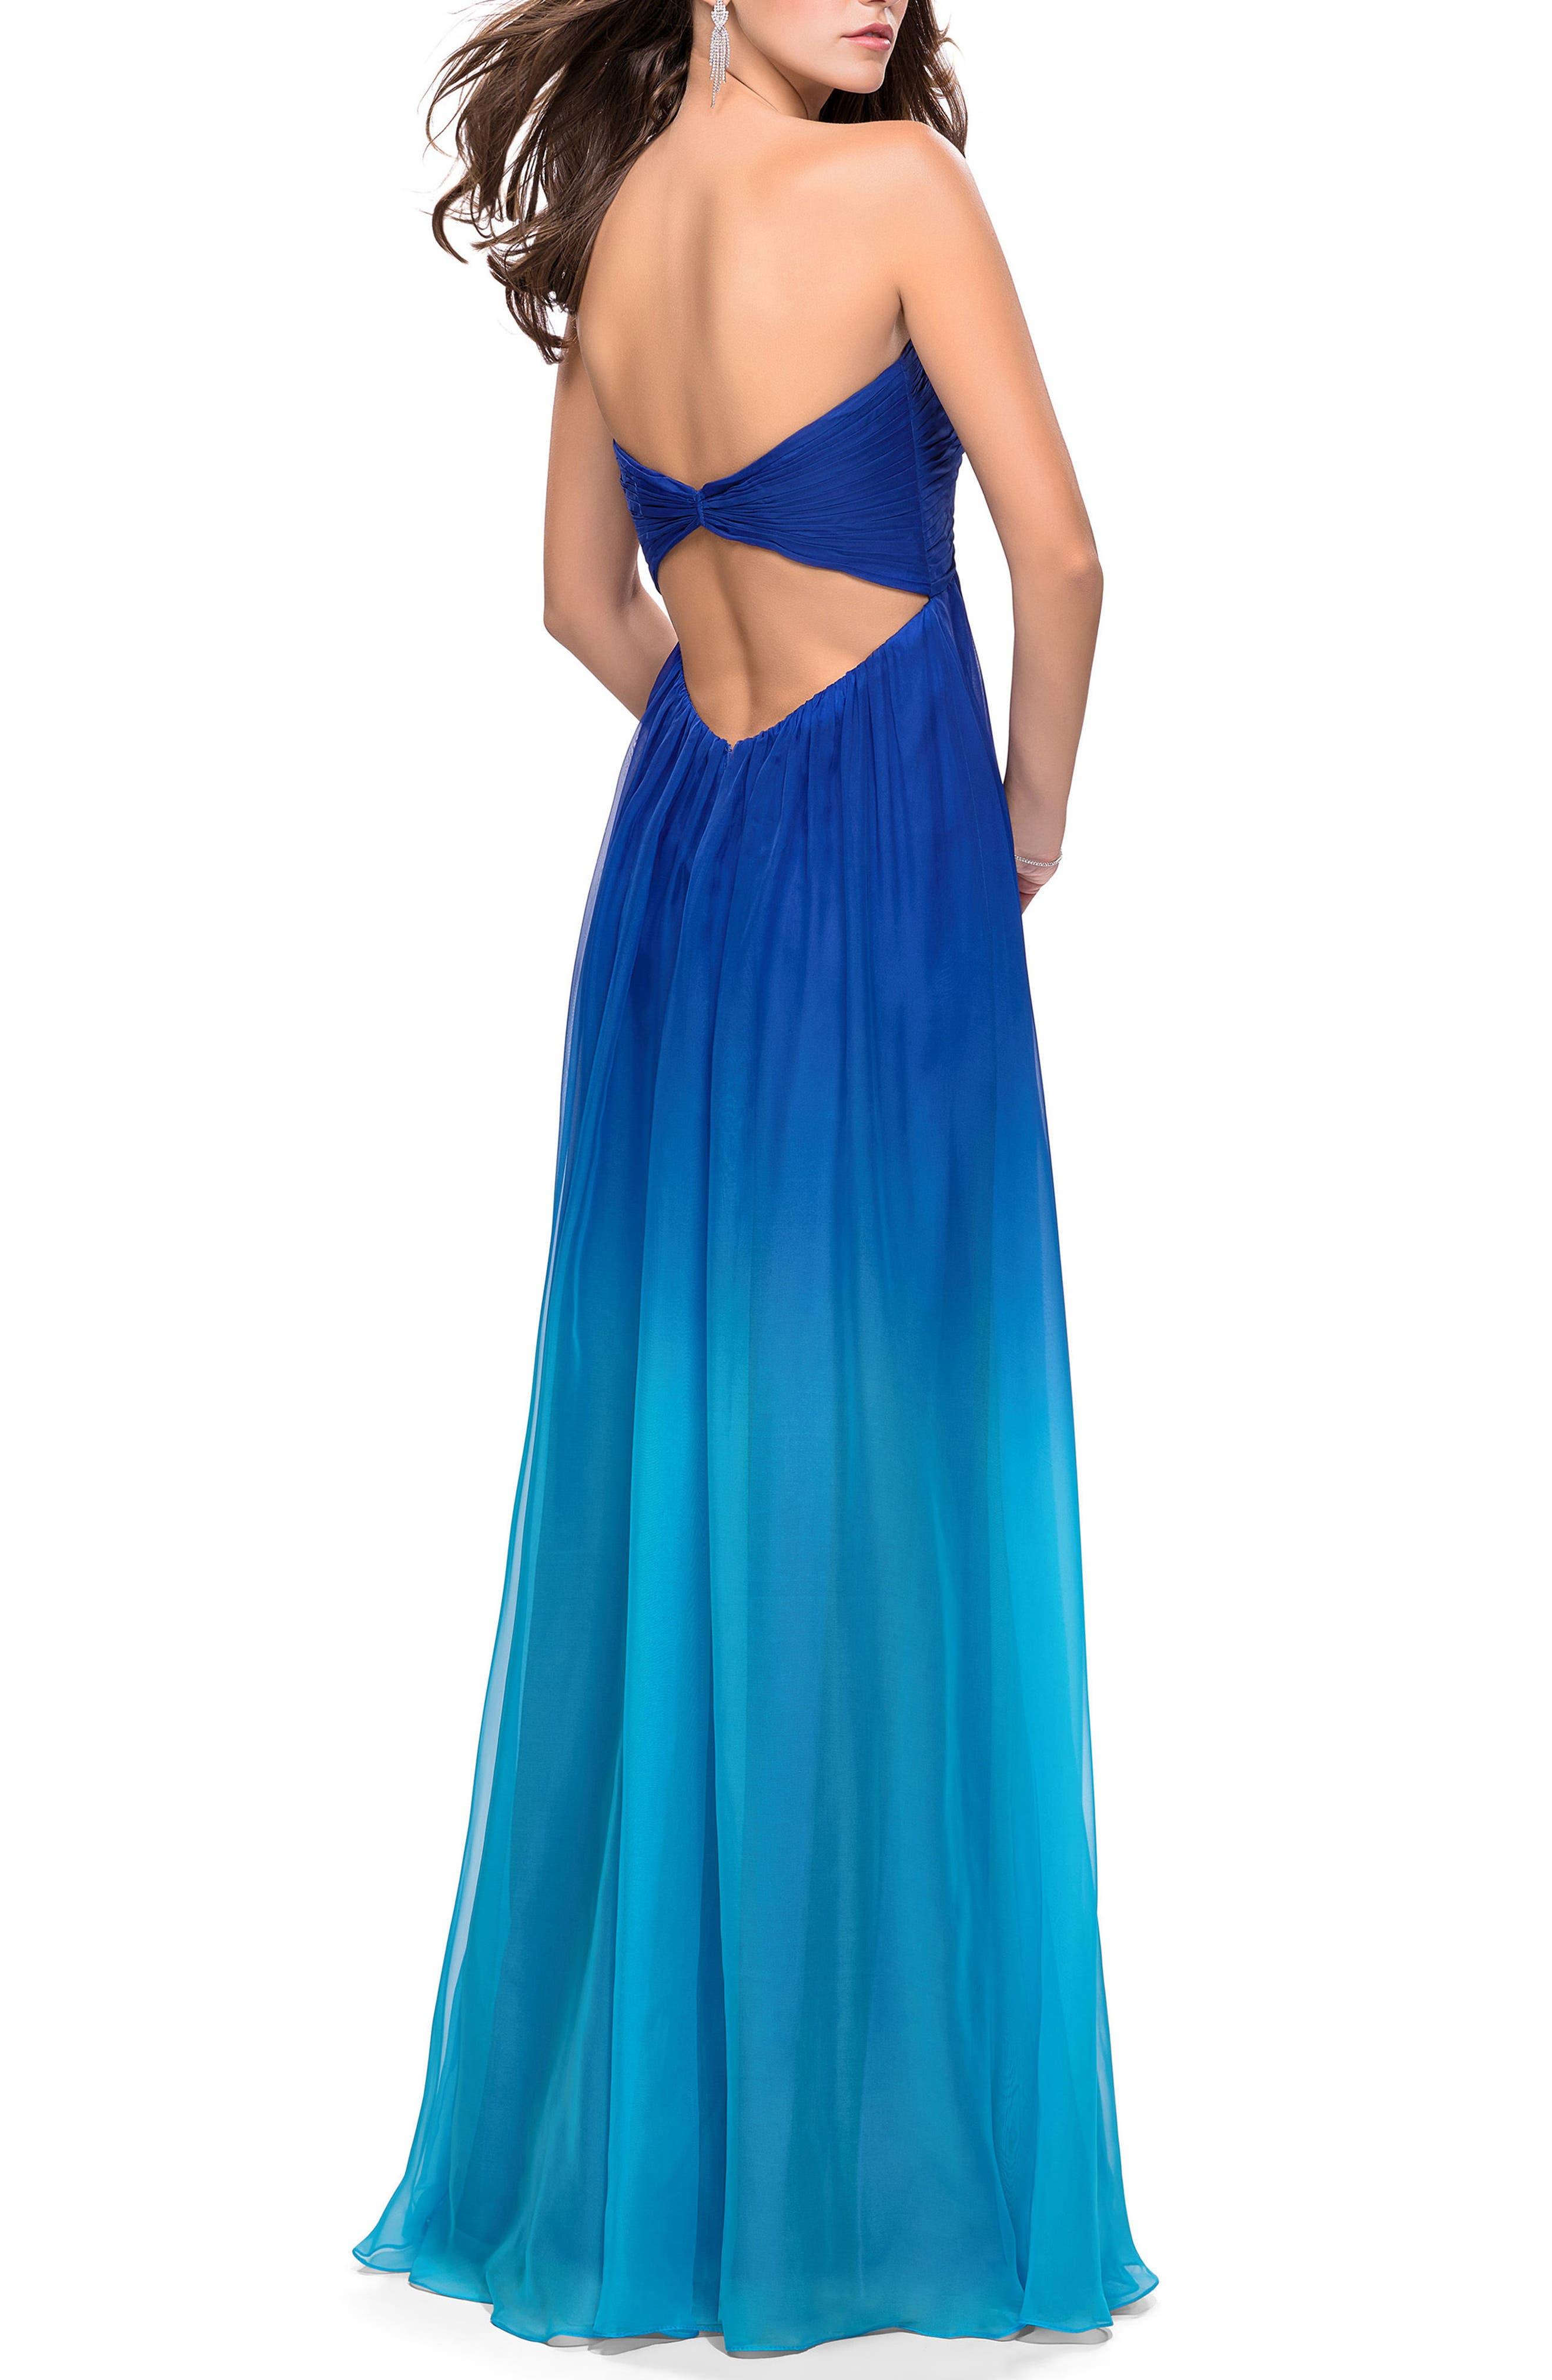 Ruched Ombré Chiffon Strapless Gown,                             Alternate thumbnail 2, color,                             Royal Aqua